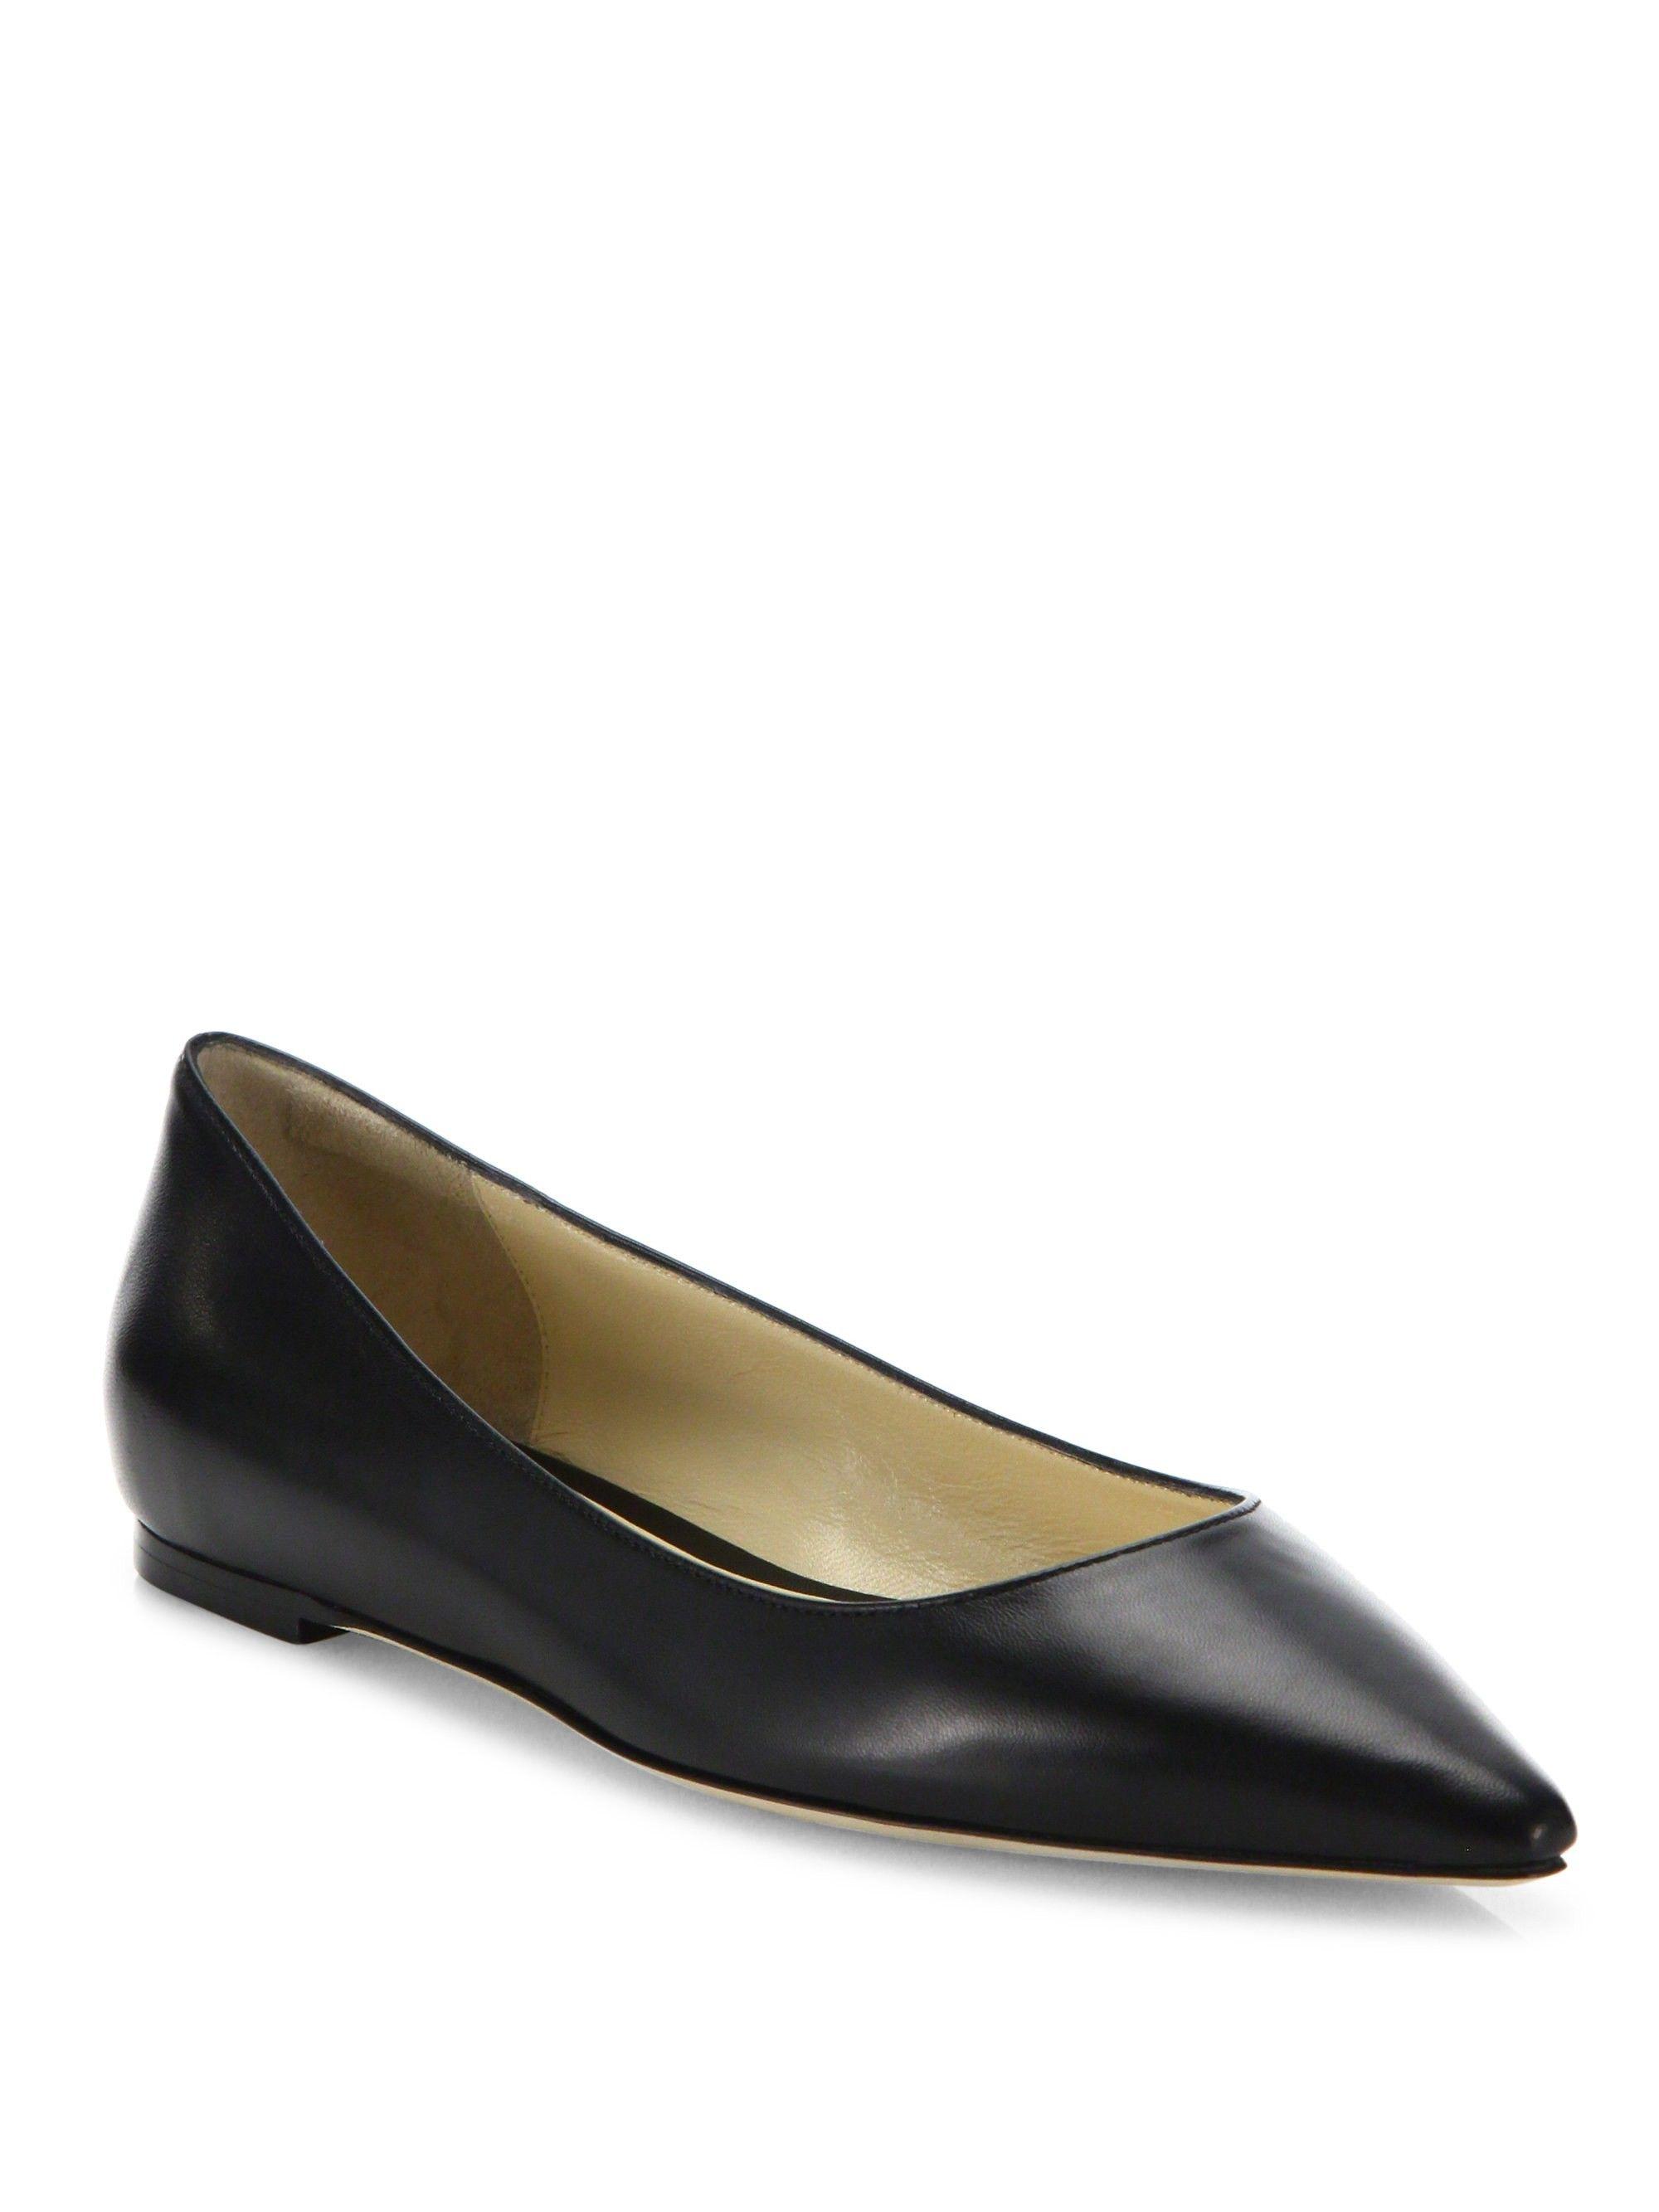 4eda23fa24 Jimmy Choo Romy Leather Point Toe Flats - Black 35 (5) | Products ...